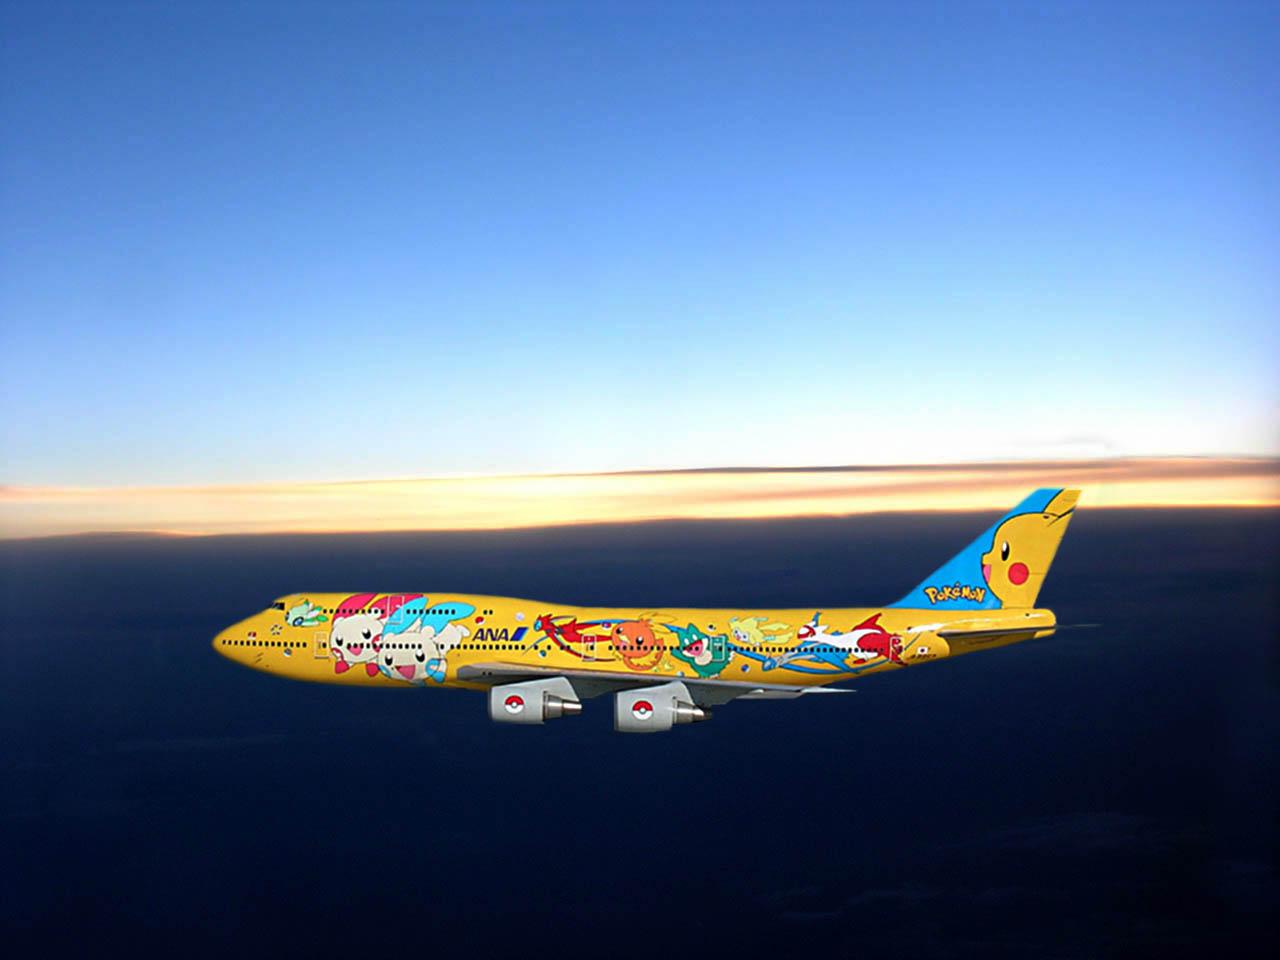 Airplane Wallpaper Hd Impremedia Net